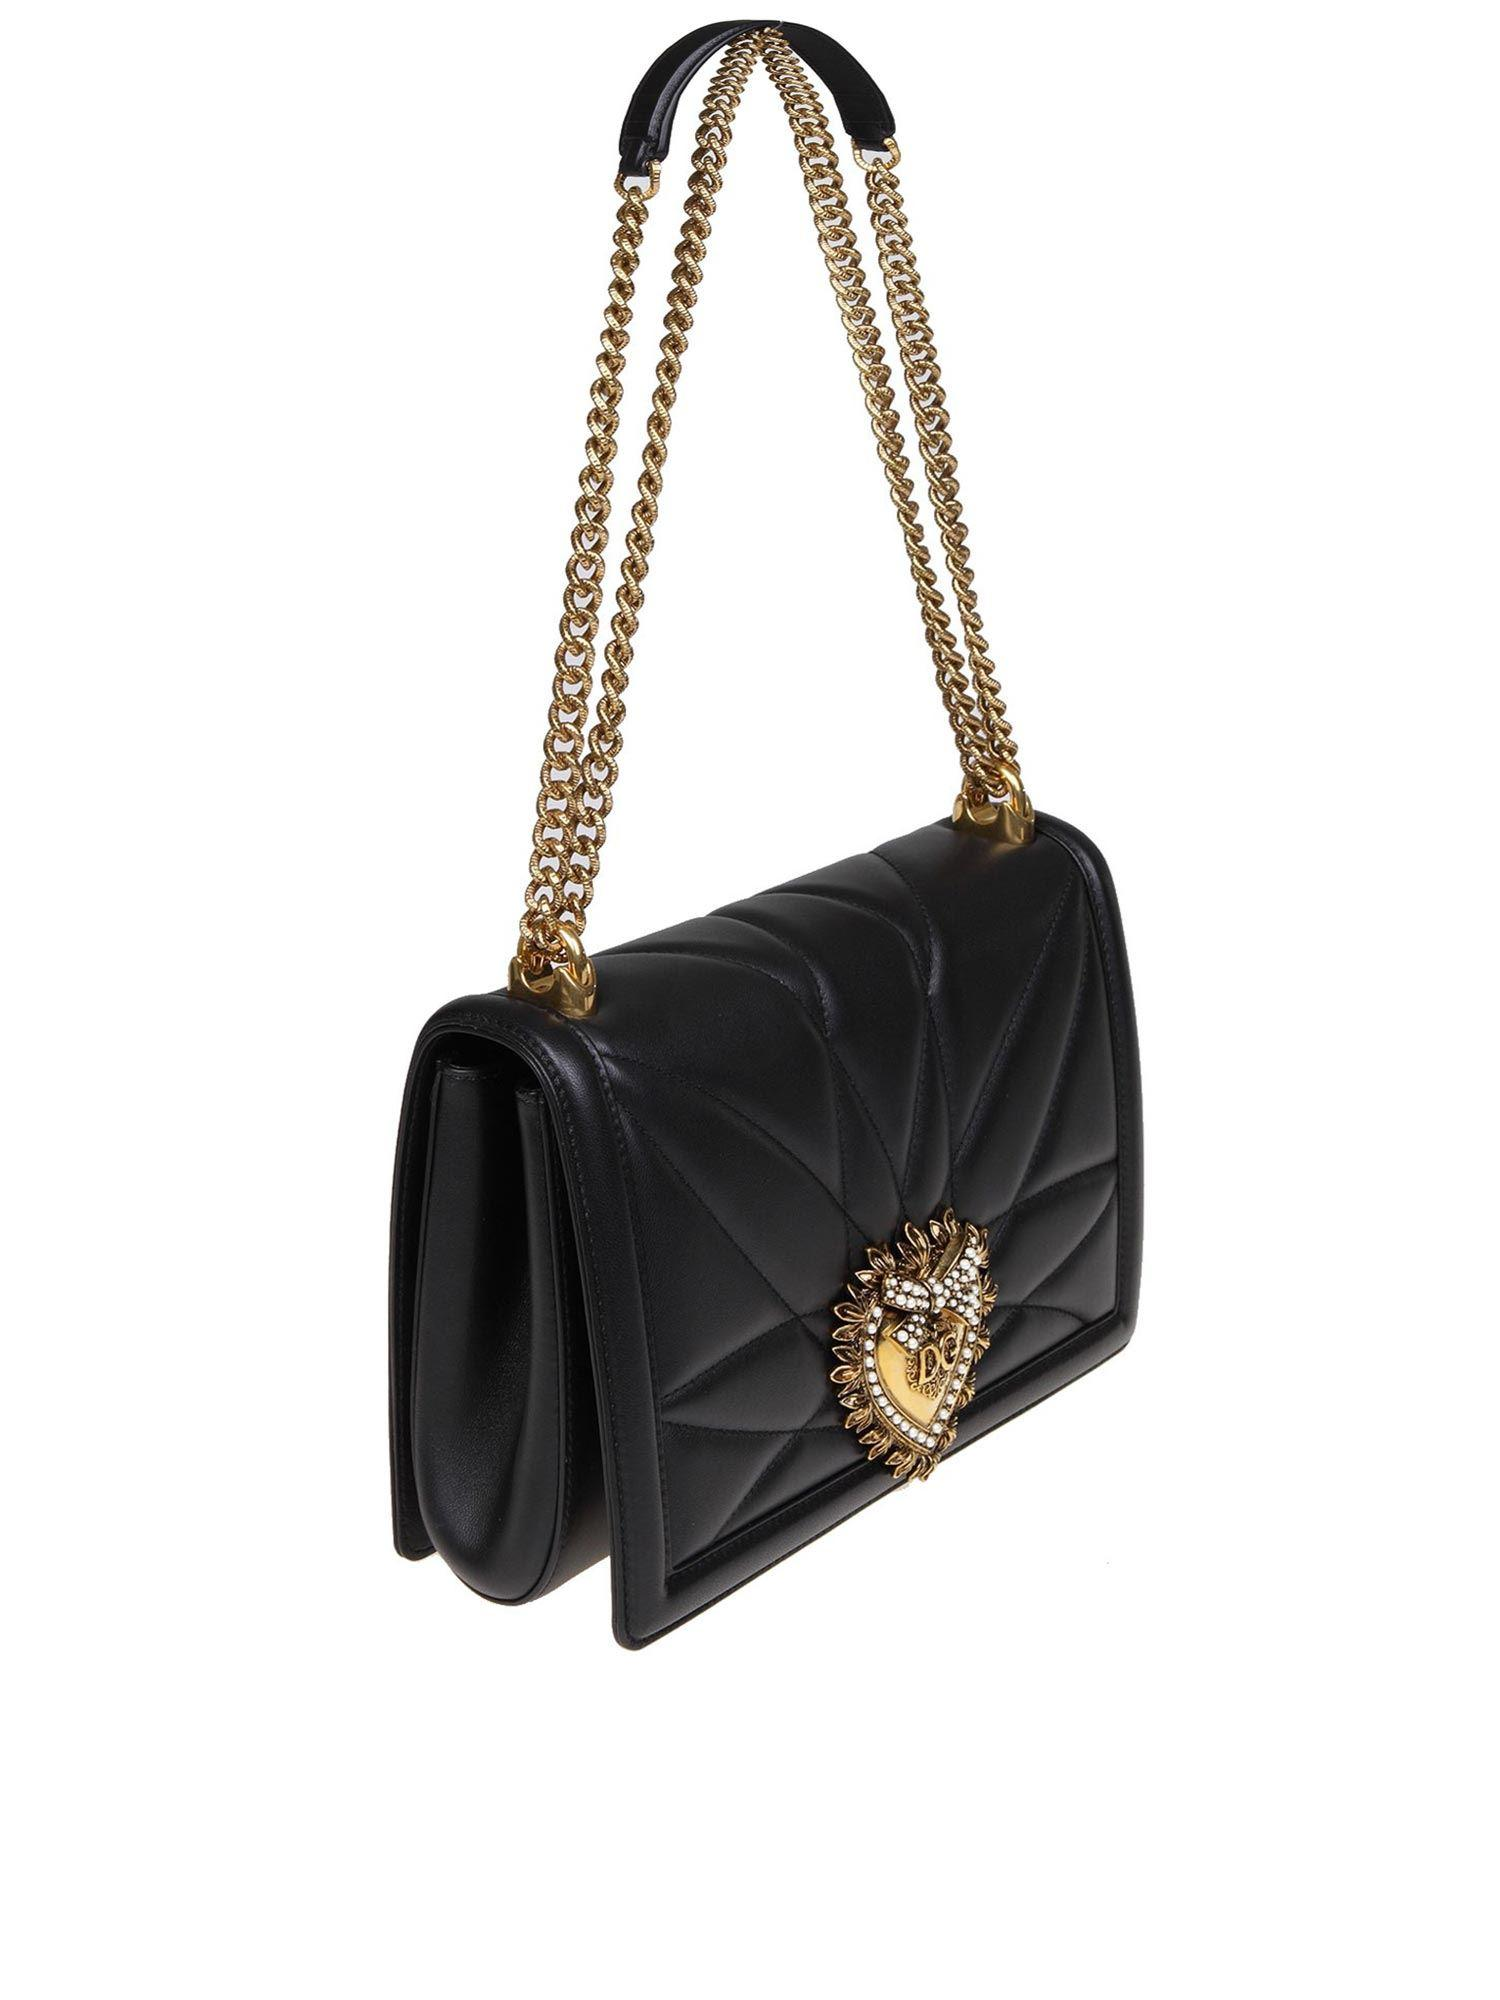 4d76b536ee68 Lyst - Dolce   Gabbana Black Bag In Nappa Devotion D g in Black - Save 8%